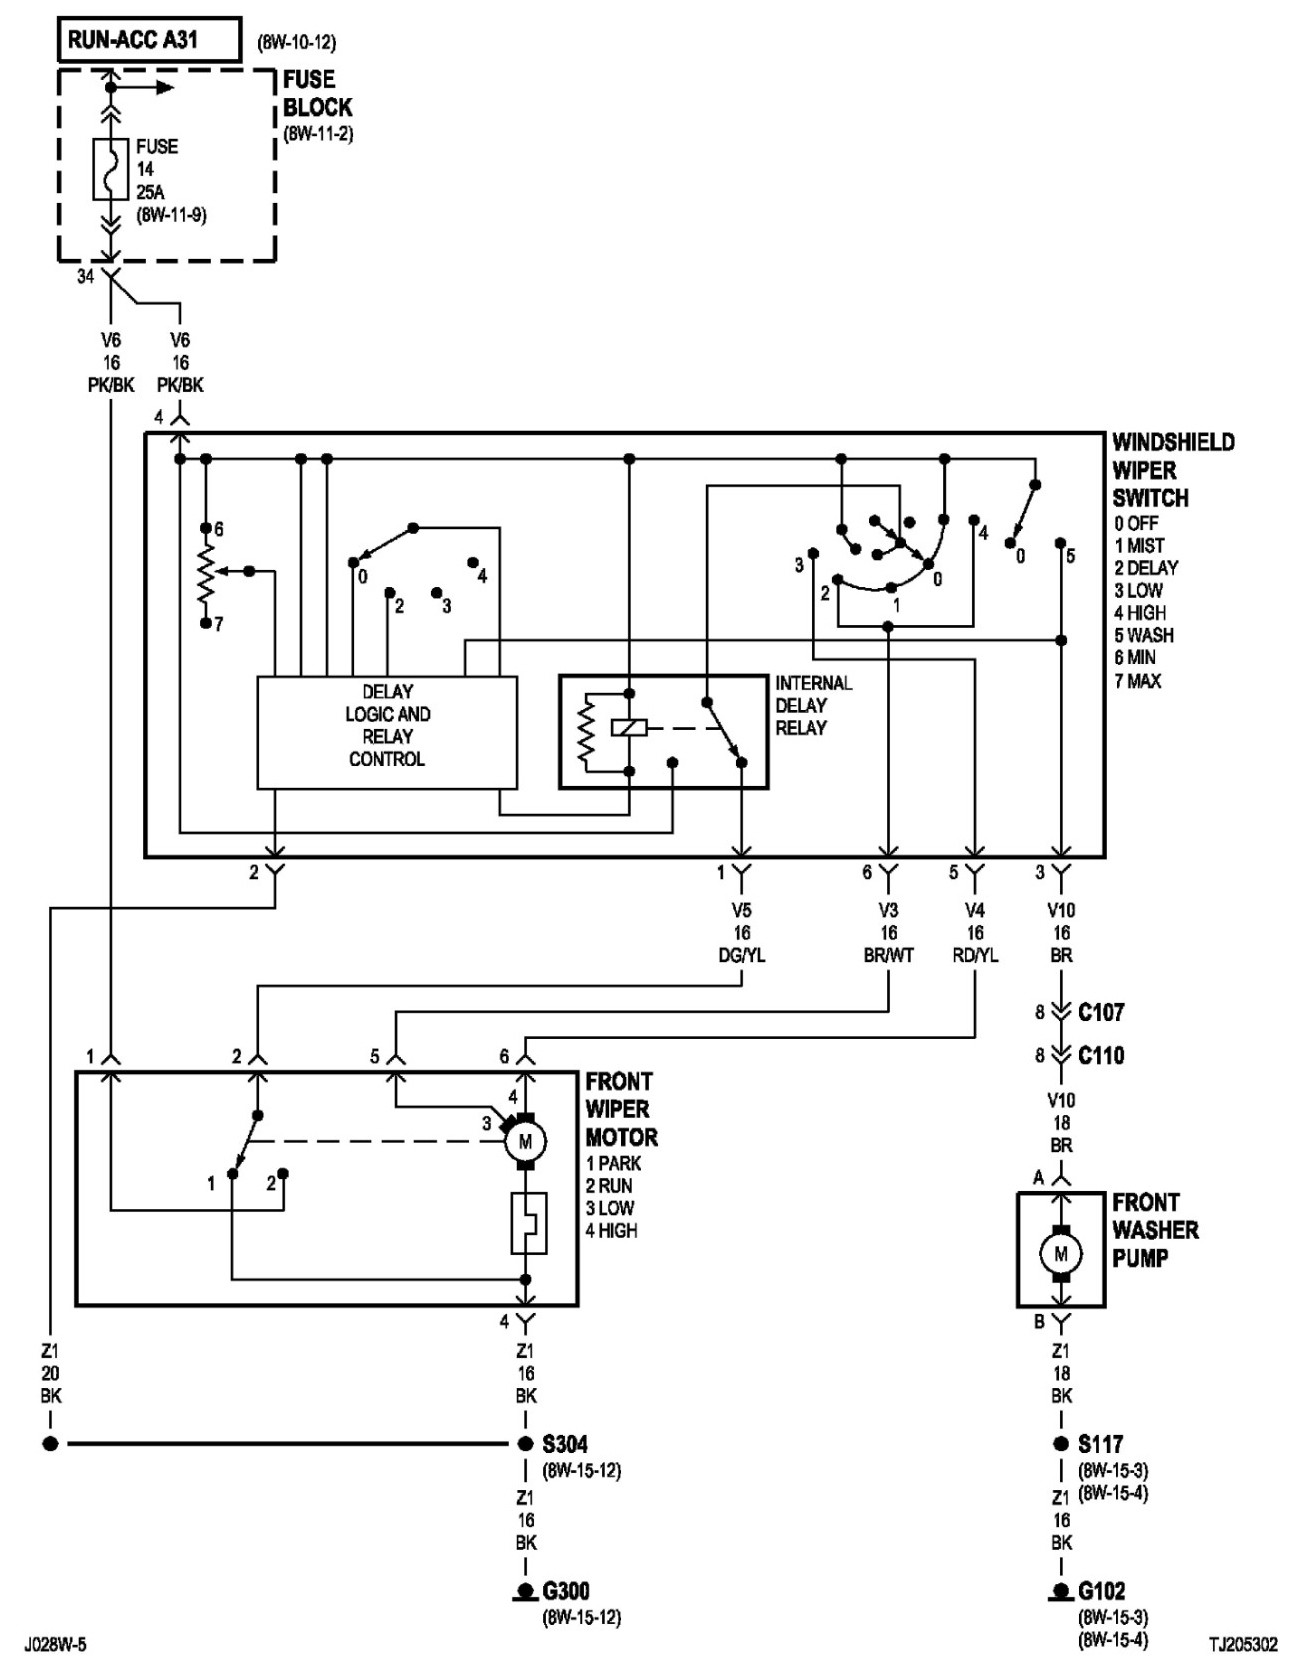 2012 Jeep Wrangler Wiring Diagram 2002 Jeep Wrangler Wiring Diagram Roc Grp Of 2012 Jeep Wrangler Wiring Diagram